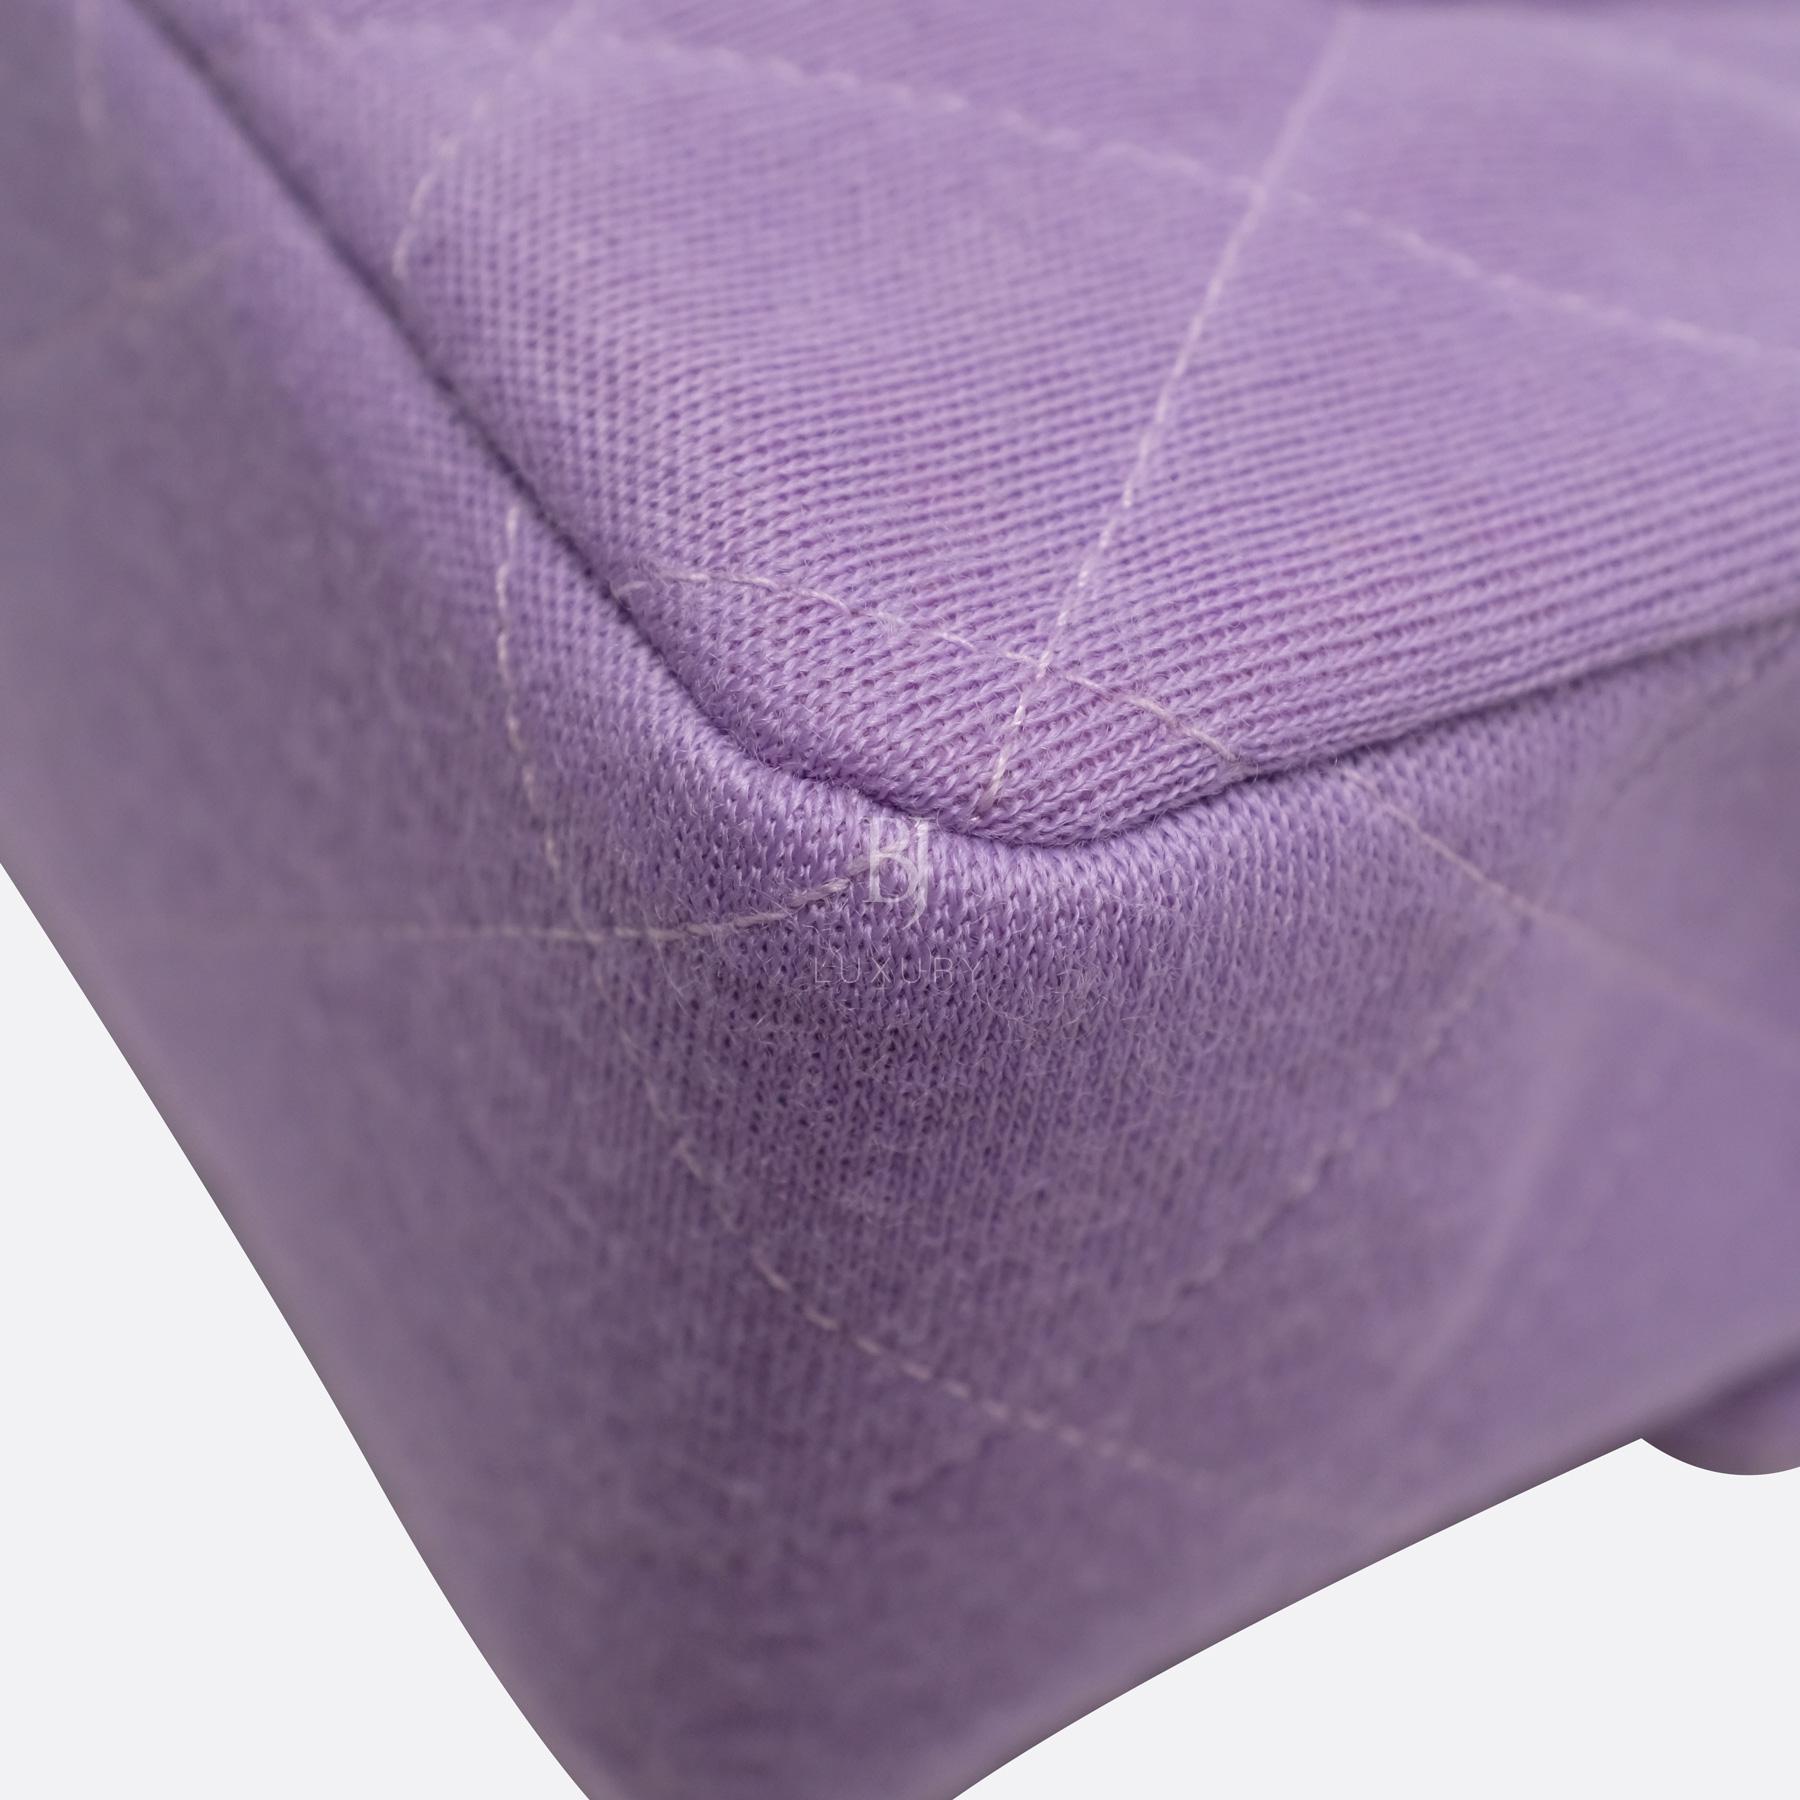 Chanel Flap Bag Medium Jersey Gold Lilac BJ Luxury 10.jpg